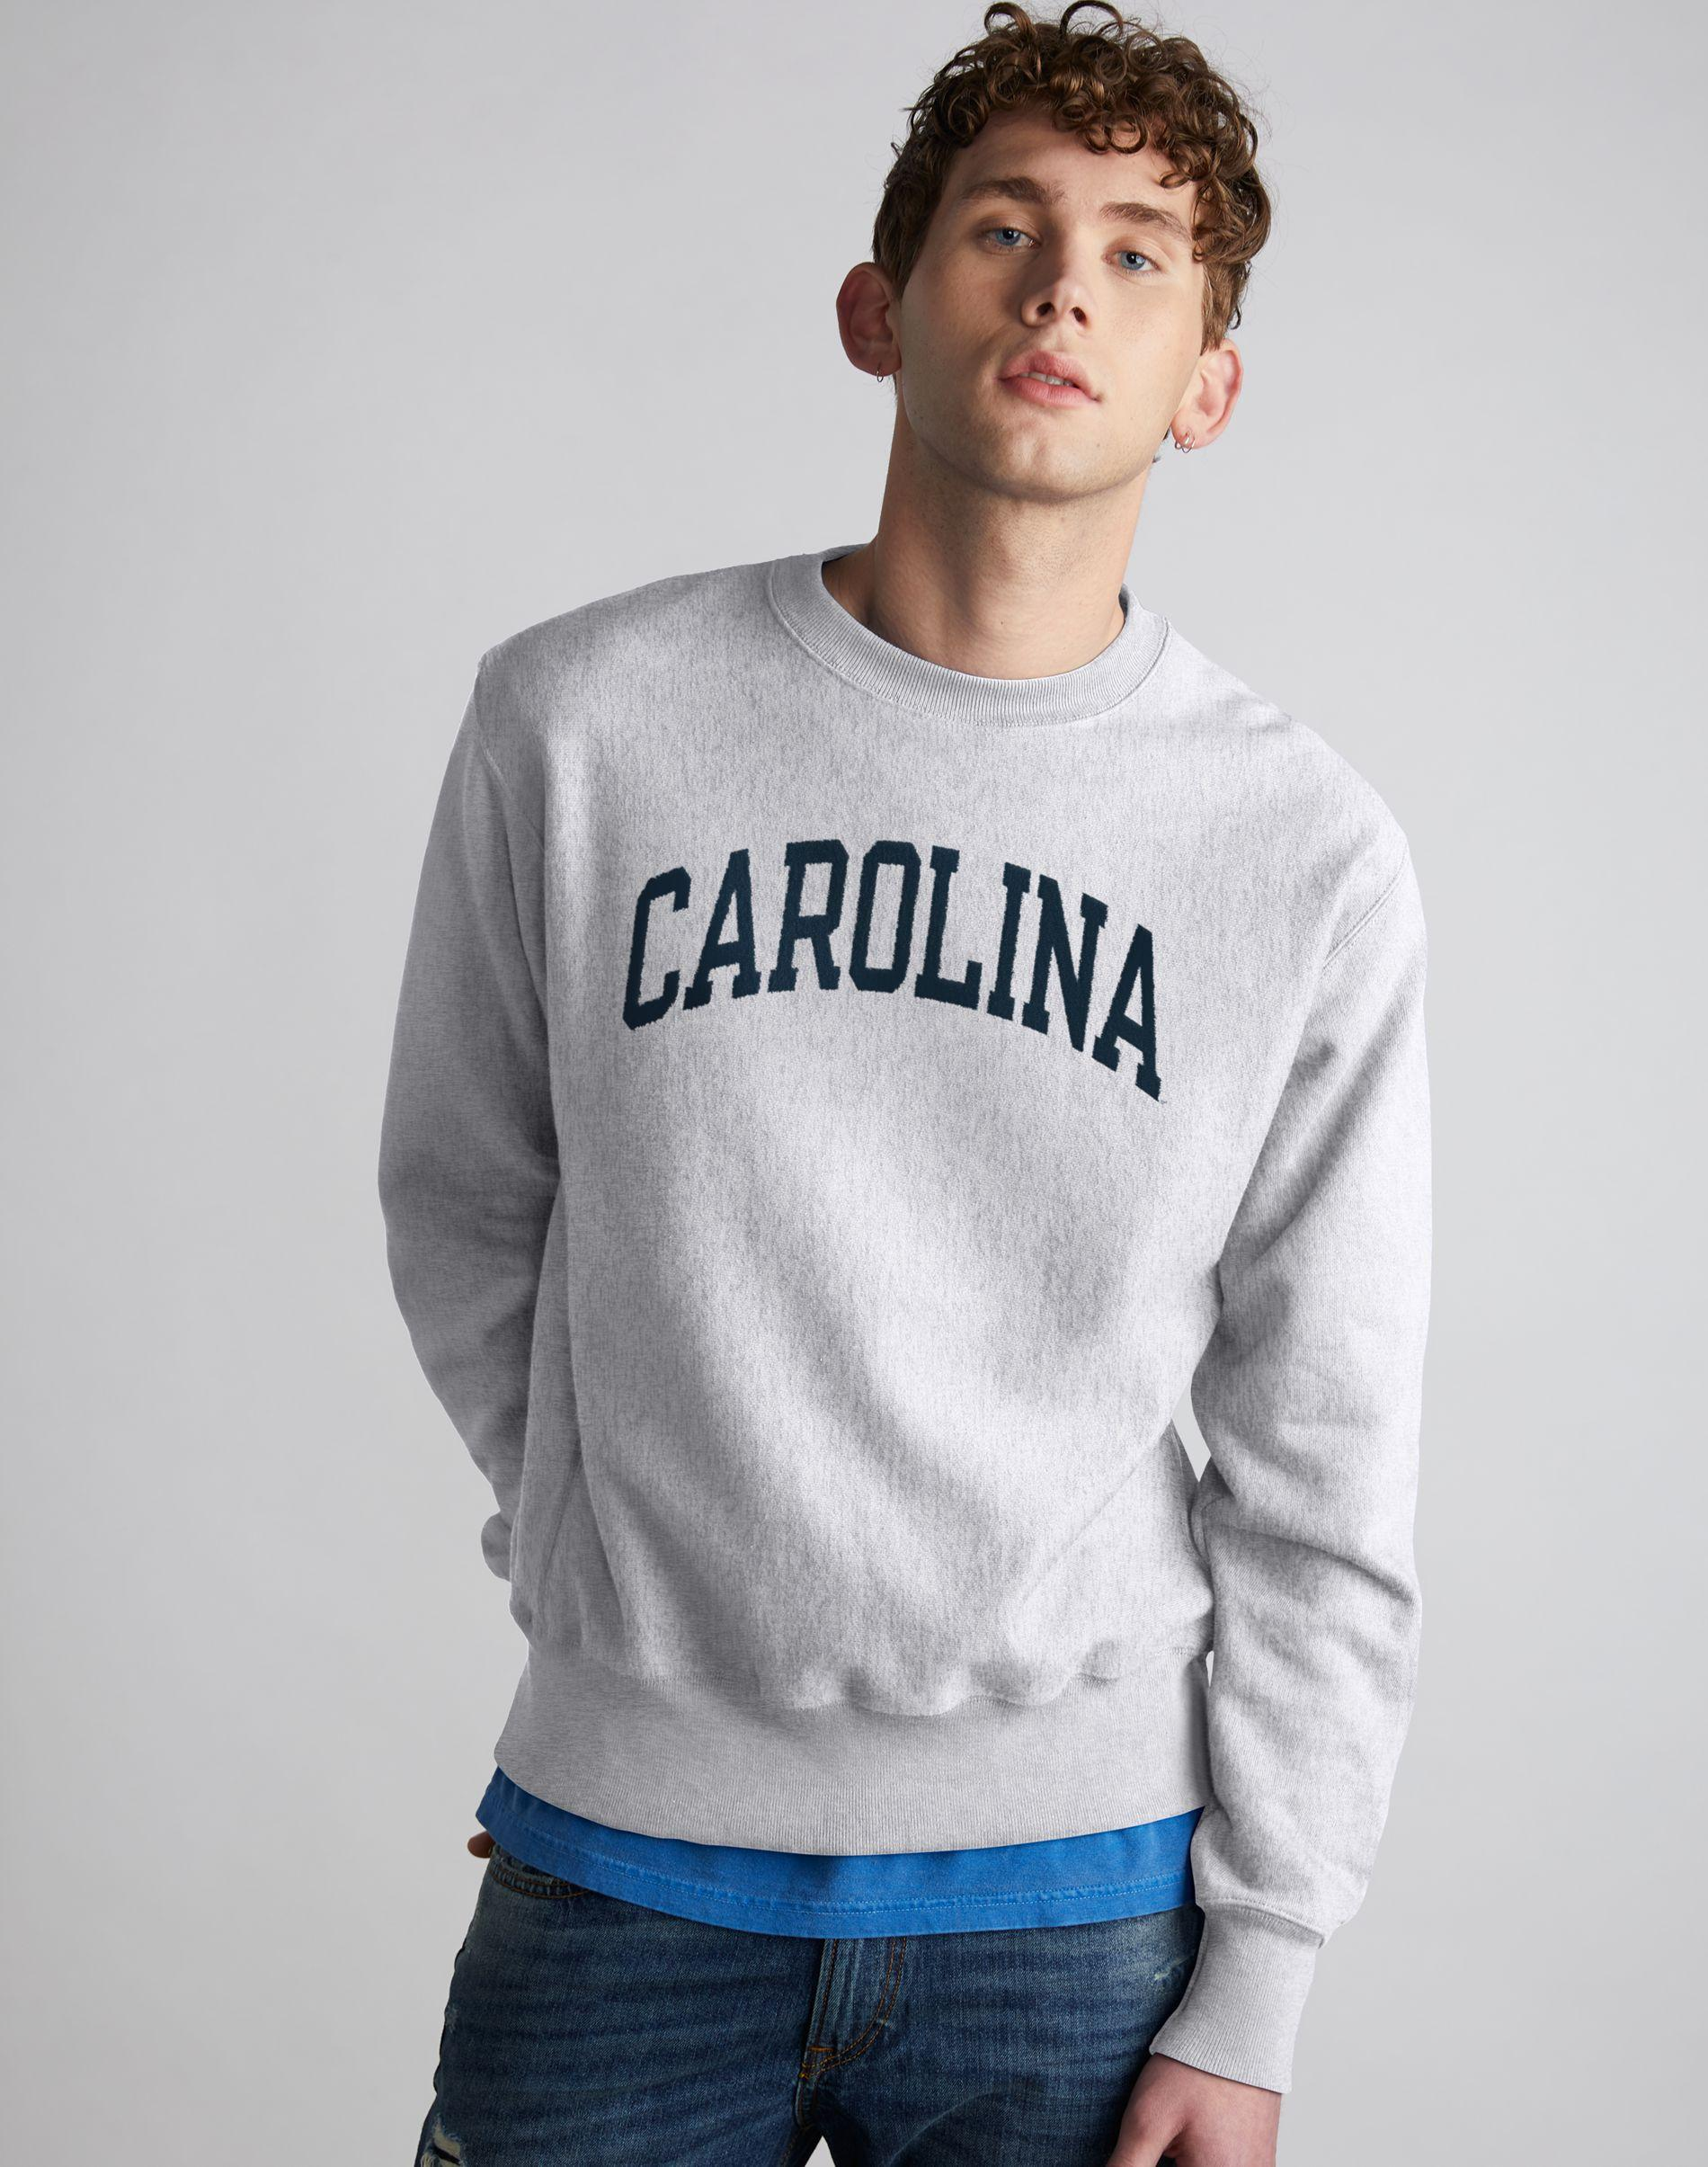 741d6953317 Lyst - Champion Life® Reverse Weave® Ncaa North Carolina Tar Heels  Sweatshirt in Gray for Men